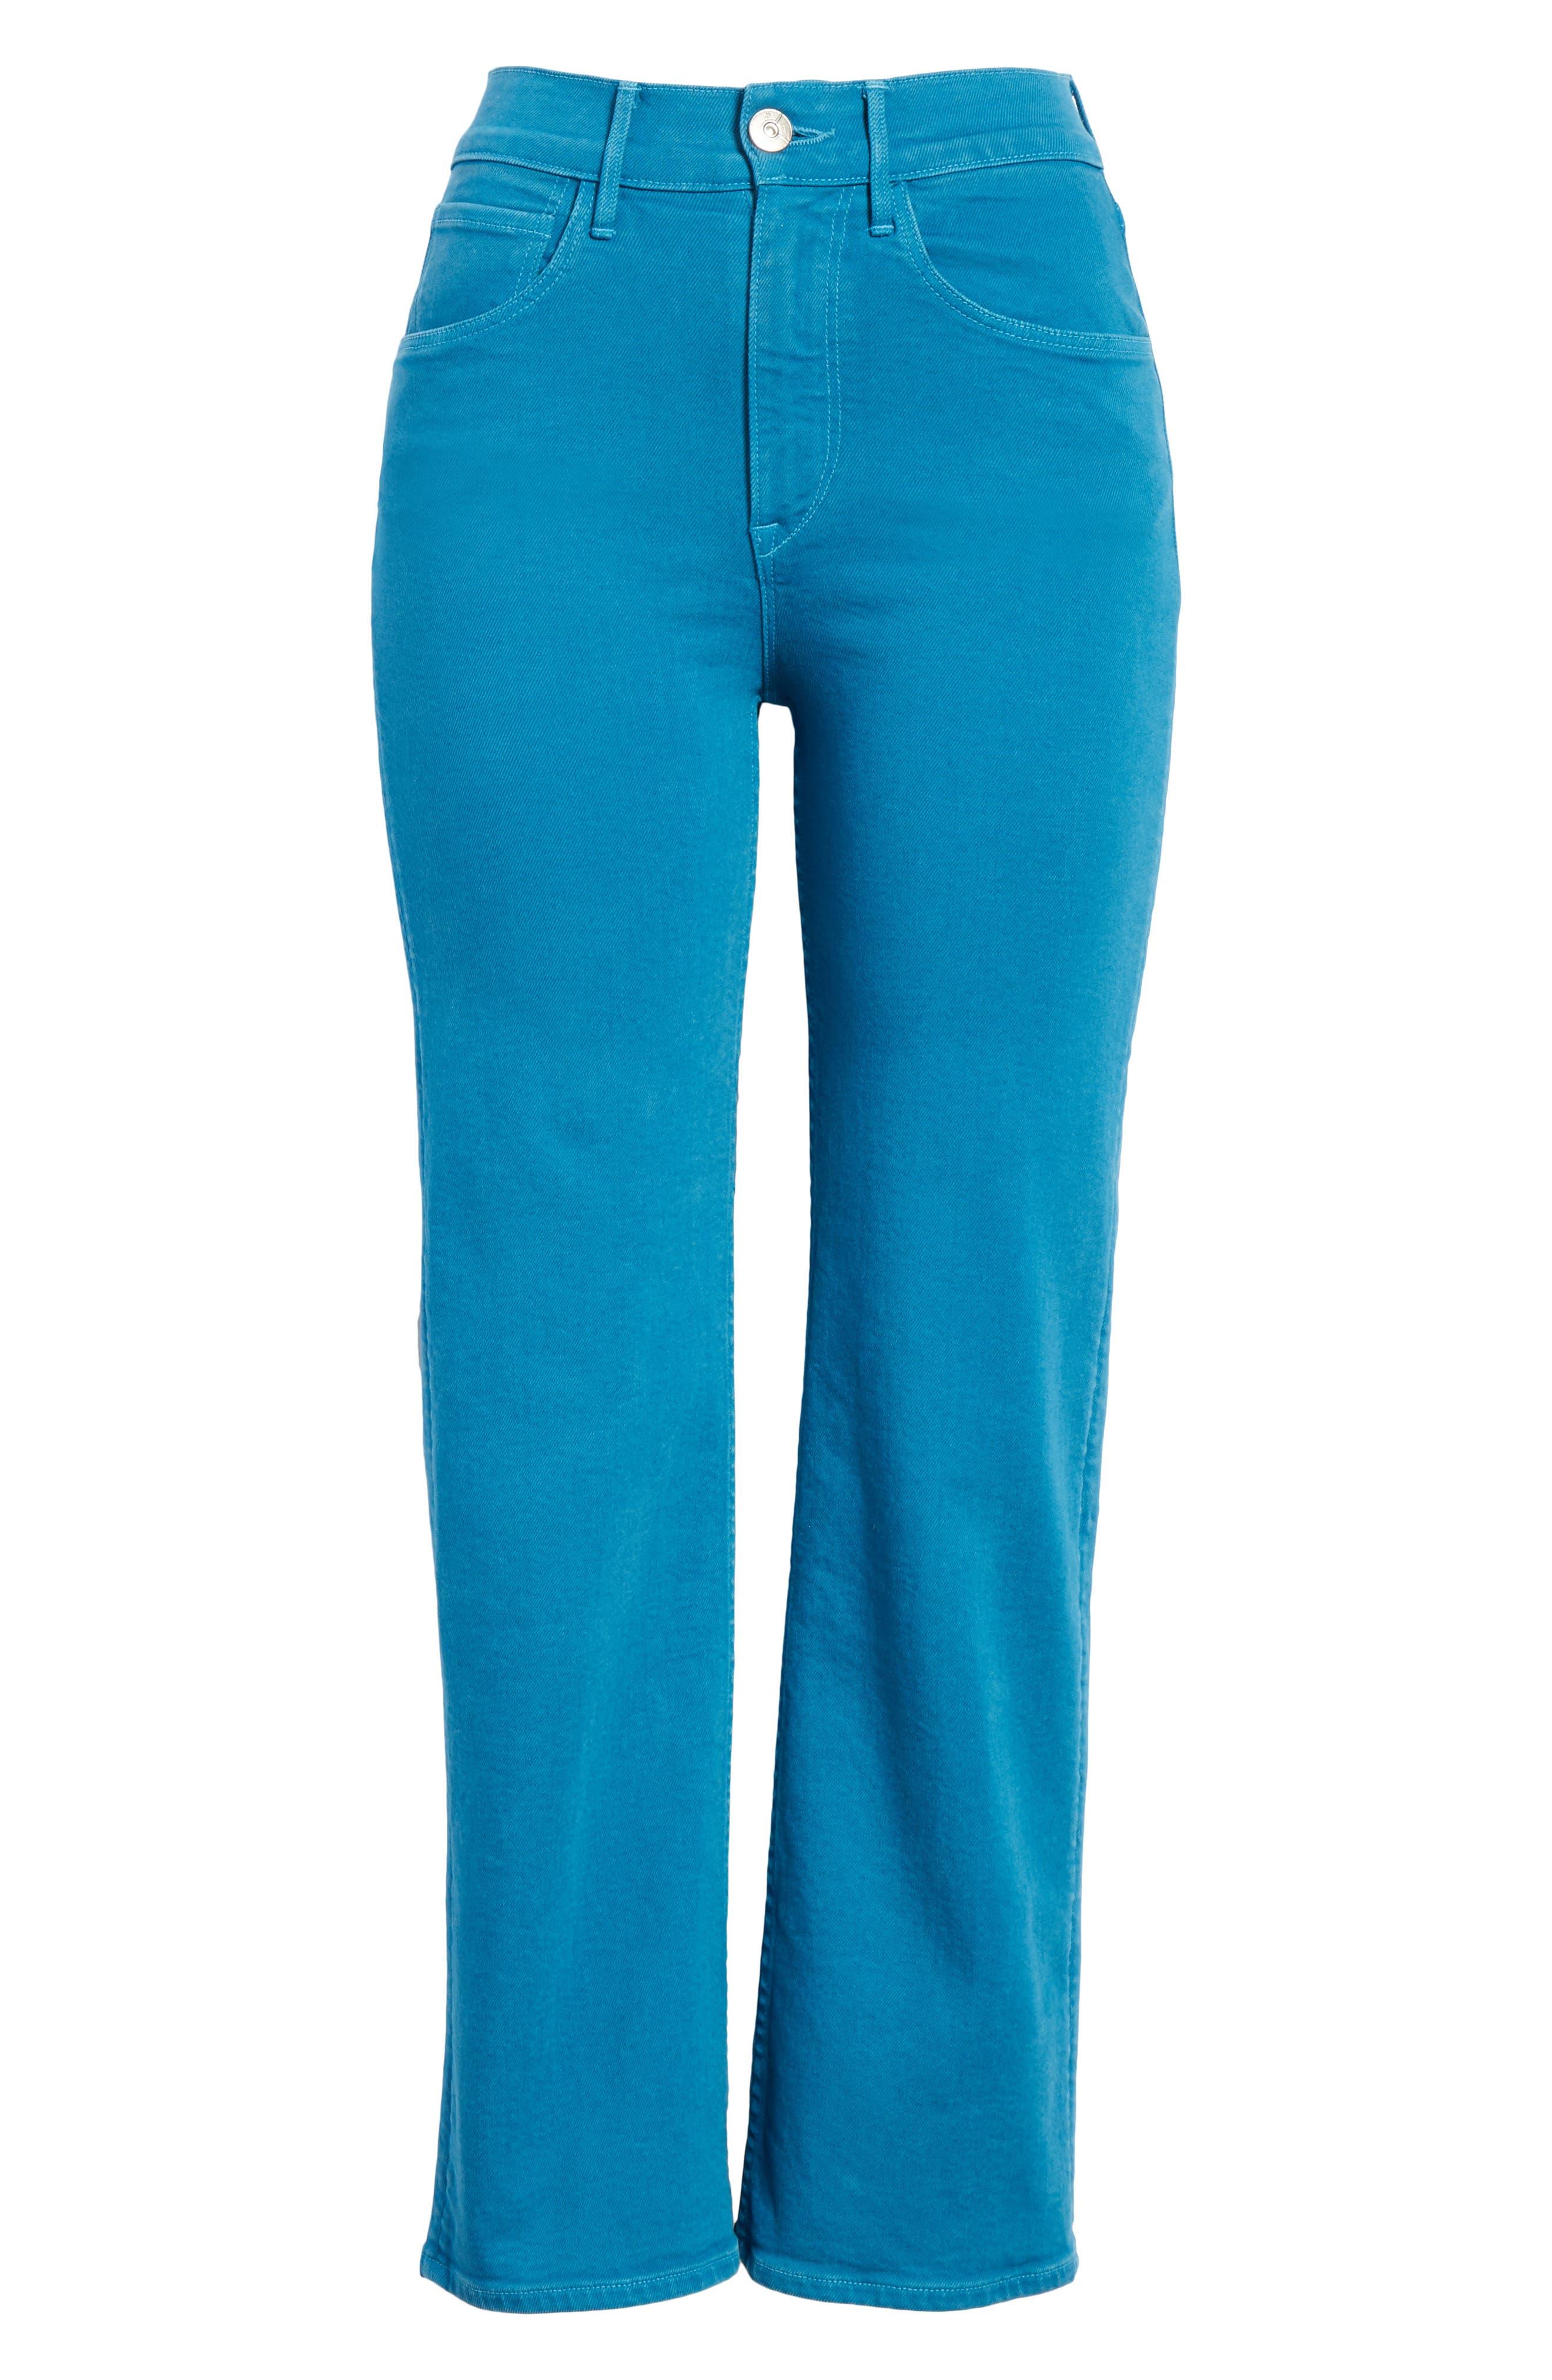 W4 Shelter Wide Leg Crop Jeans,                             Alternate thumbnail 6, color,                             Peacock Blue